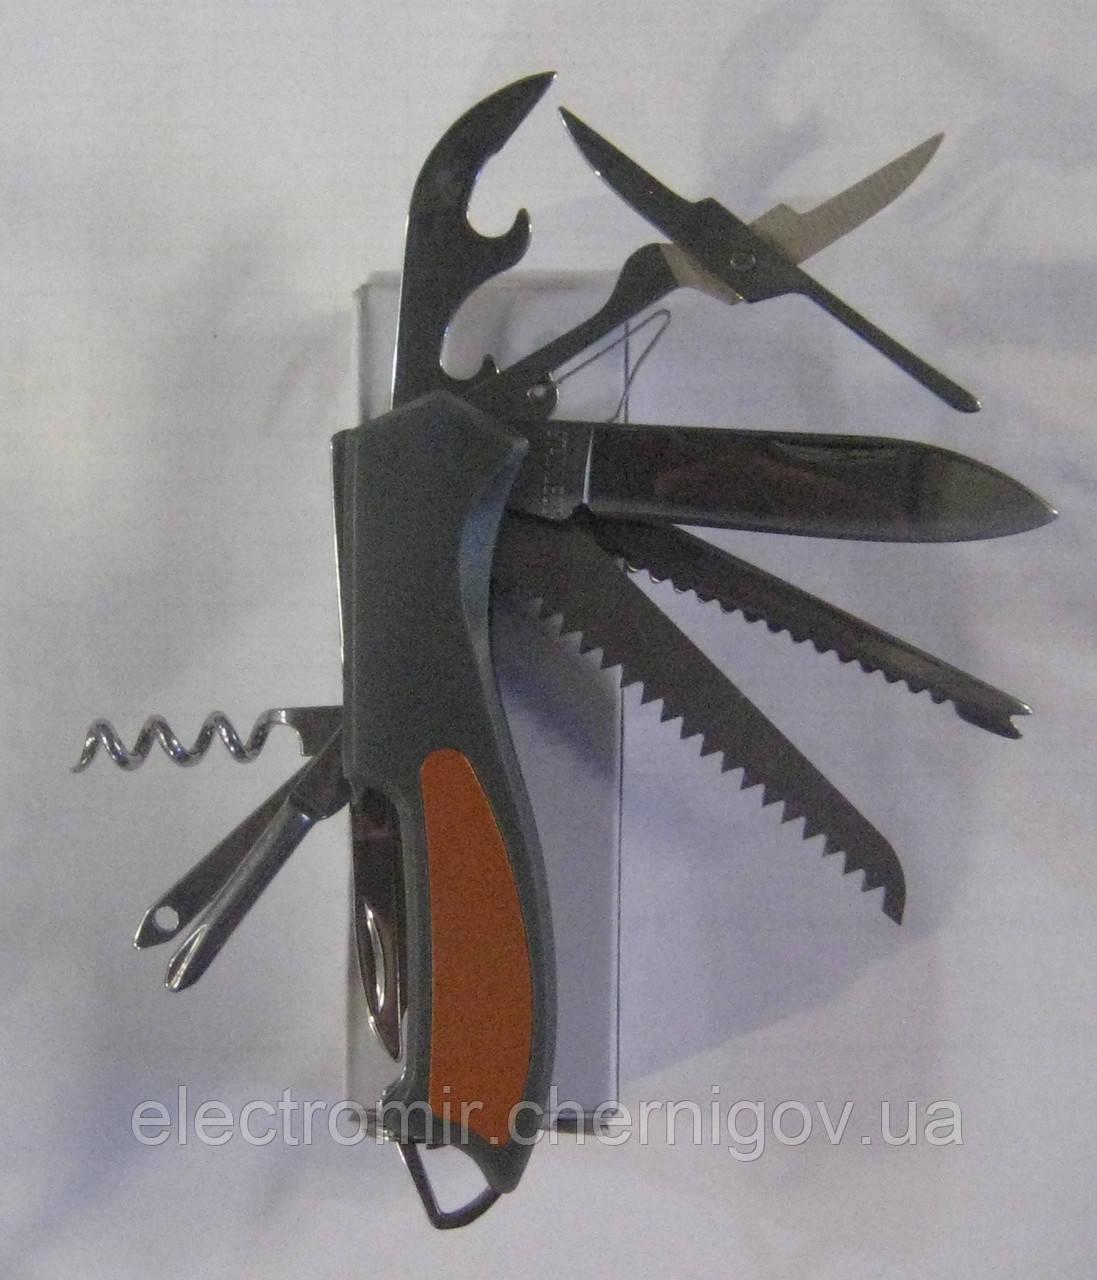 Нож складной KF-3011 LG5 (11 функций)